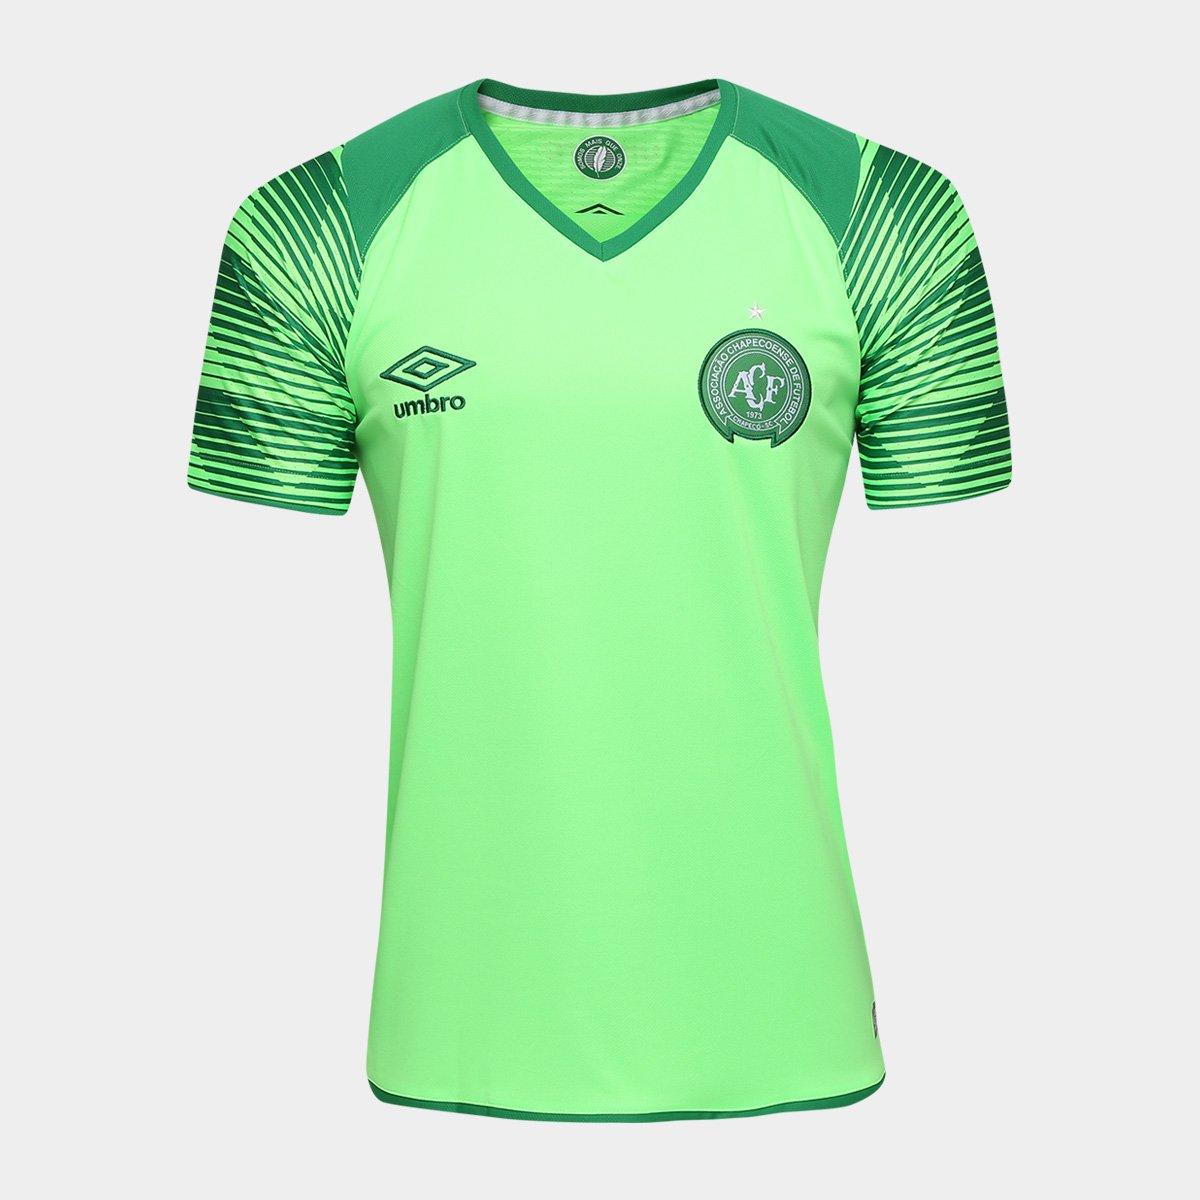 461a6e978a0a6 Camisa Chapecoense Goleiro 17 18 nº 1 Torcedor Umbro Masculina - Verde  claro - Compre Agora